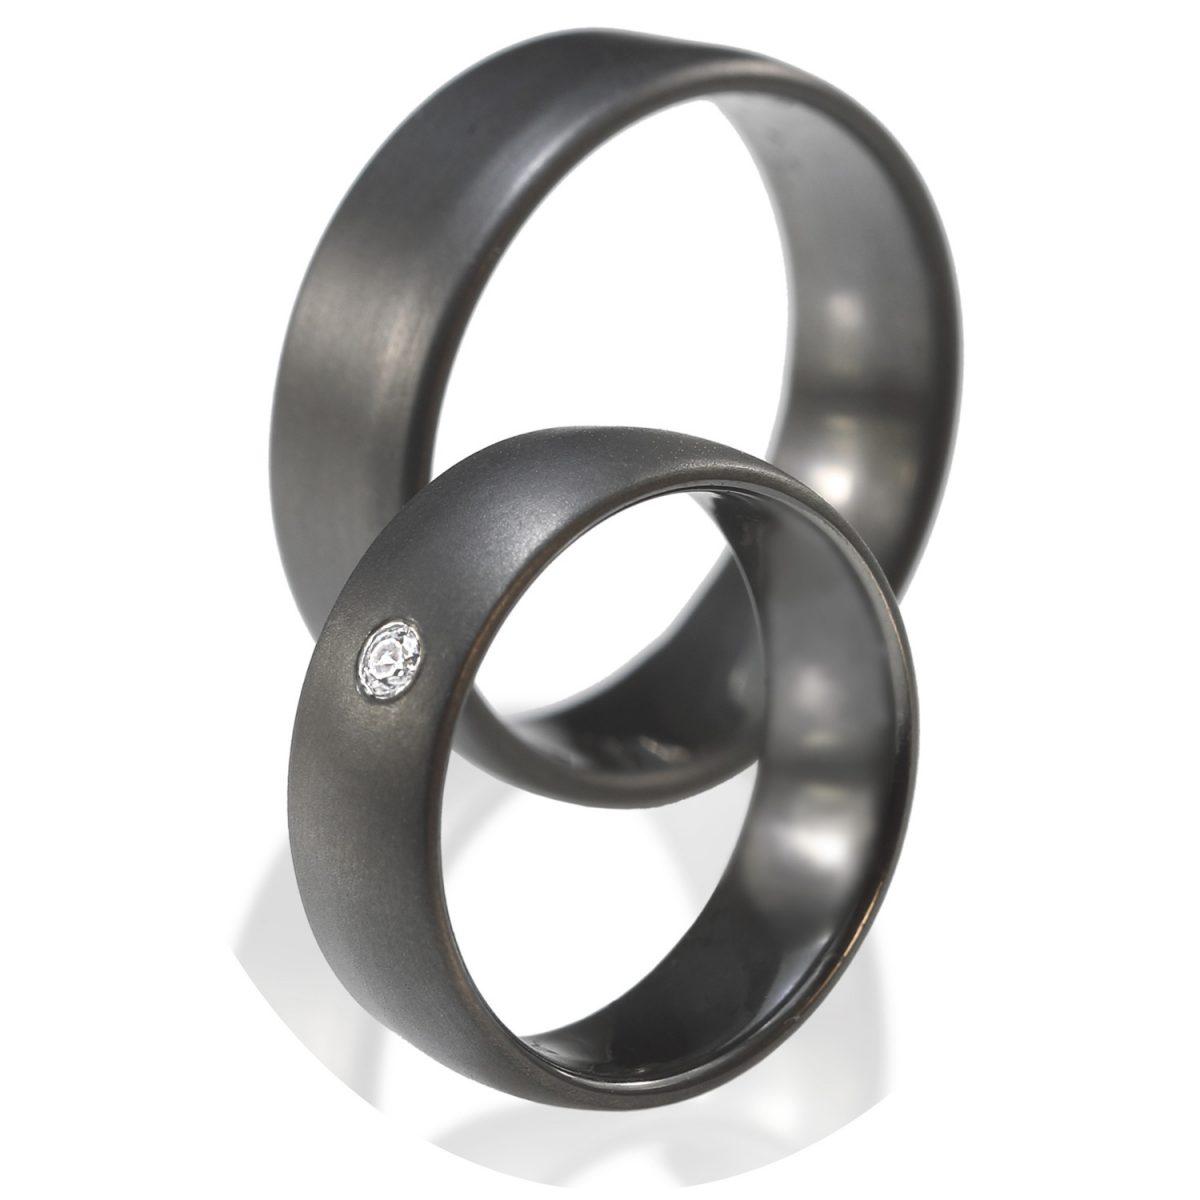 Tantal Eheringe | Ringpaar True Love Collection No:7